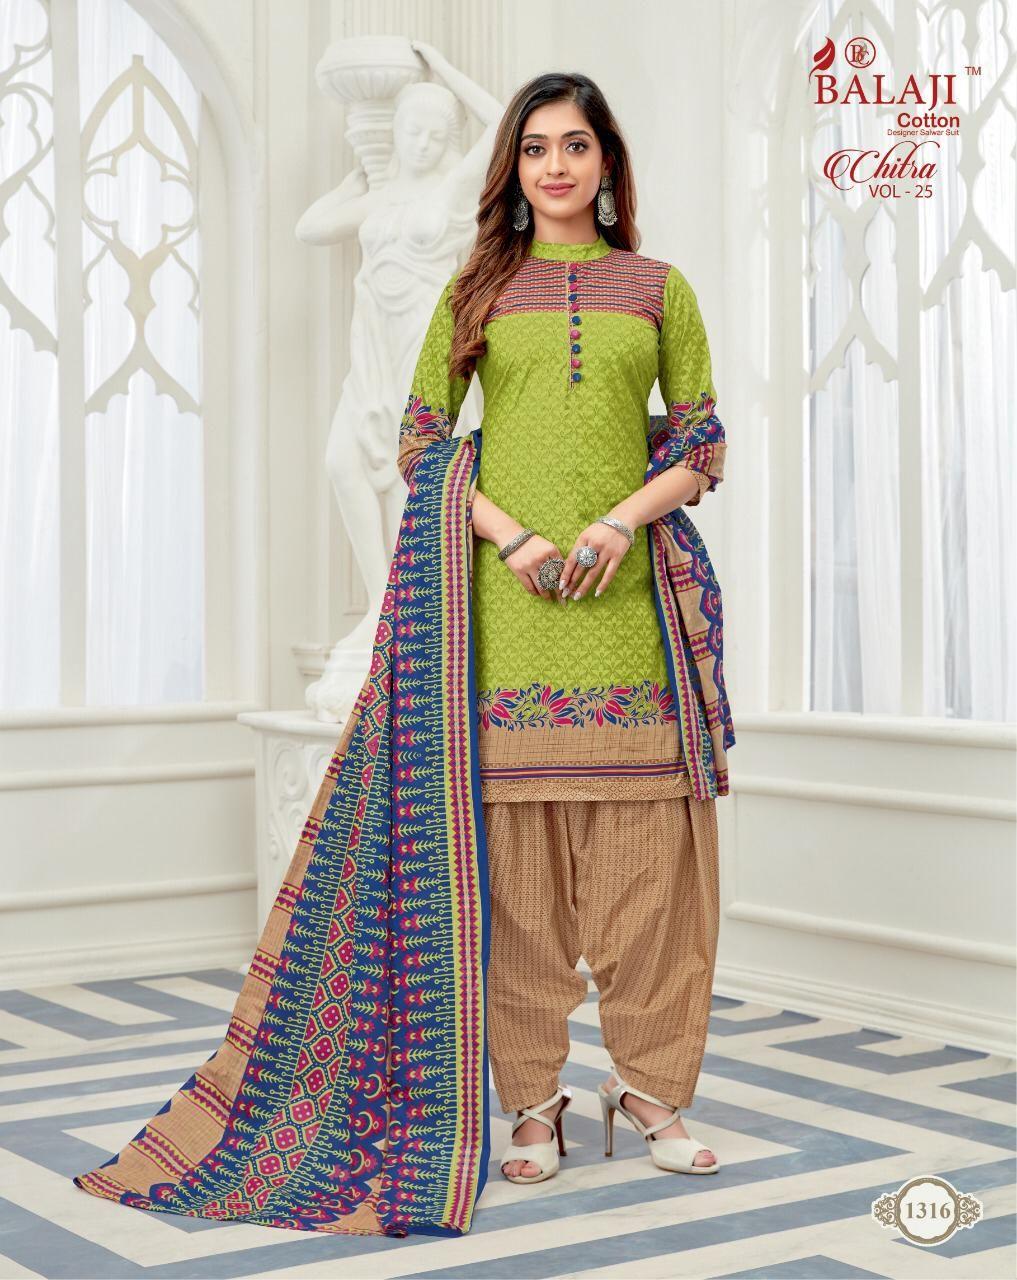 Balaji-Chitra-Vol-25-17